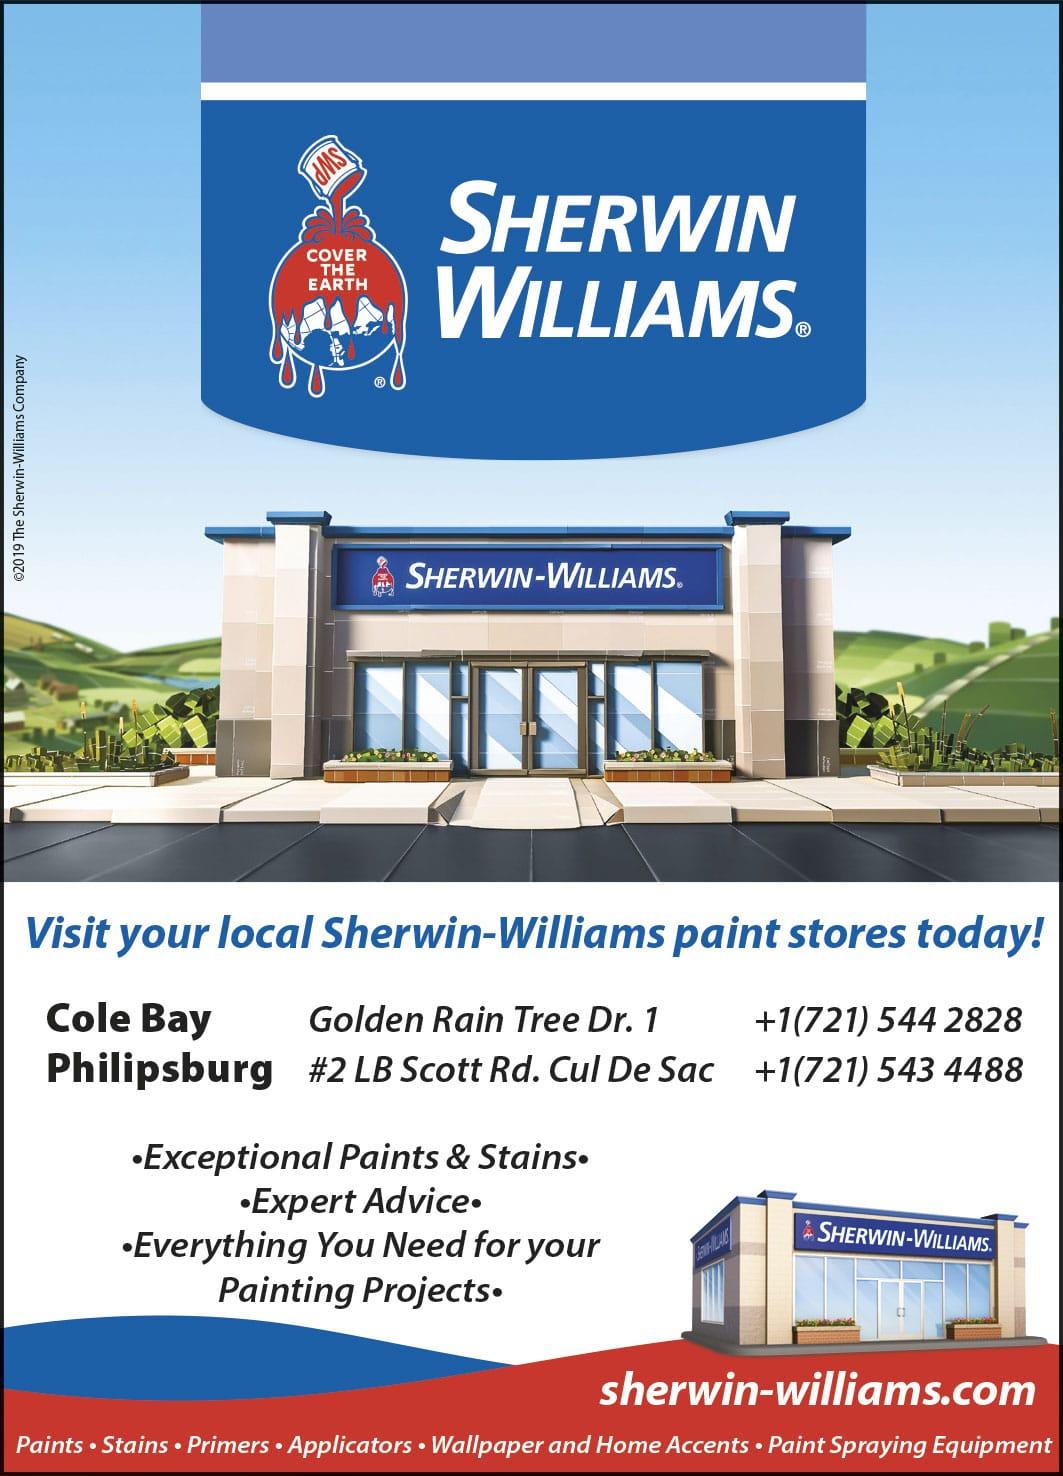 St Maarten Telephone Directory - Sherwin Williams